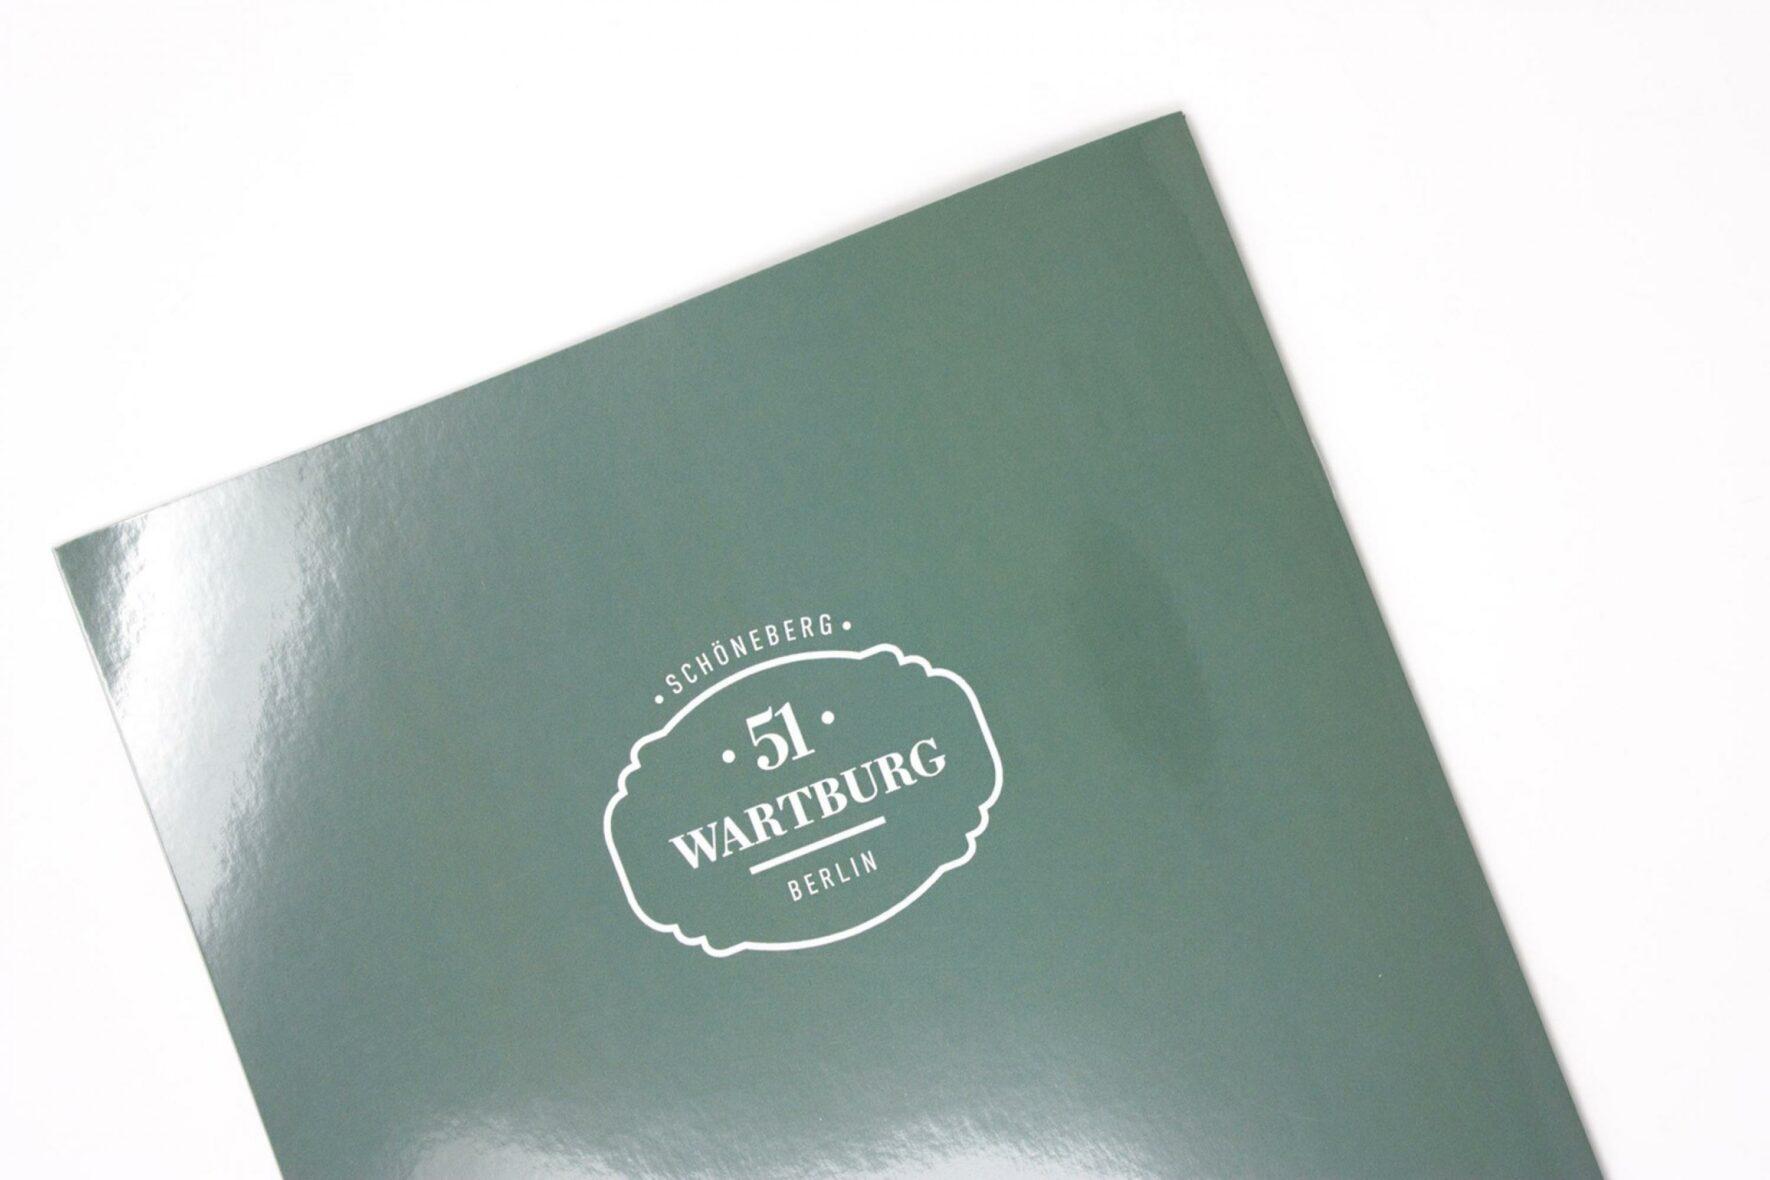 Immobilienbranding-wartburg-Trendcity-Broschüre-FORMLOS-berlin_MG_8276